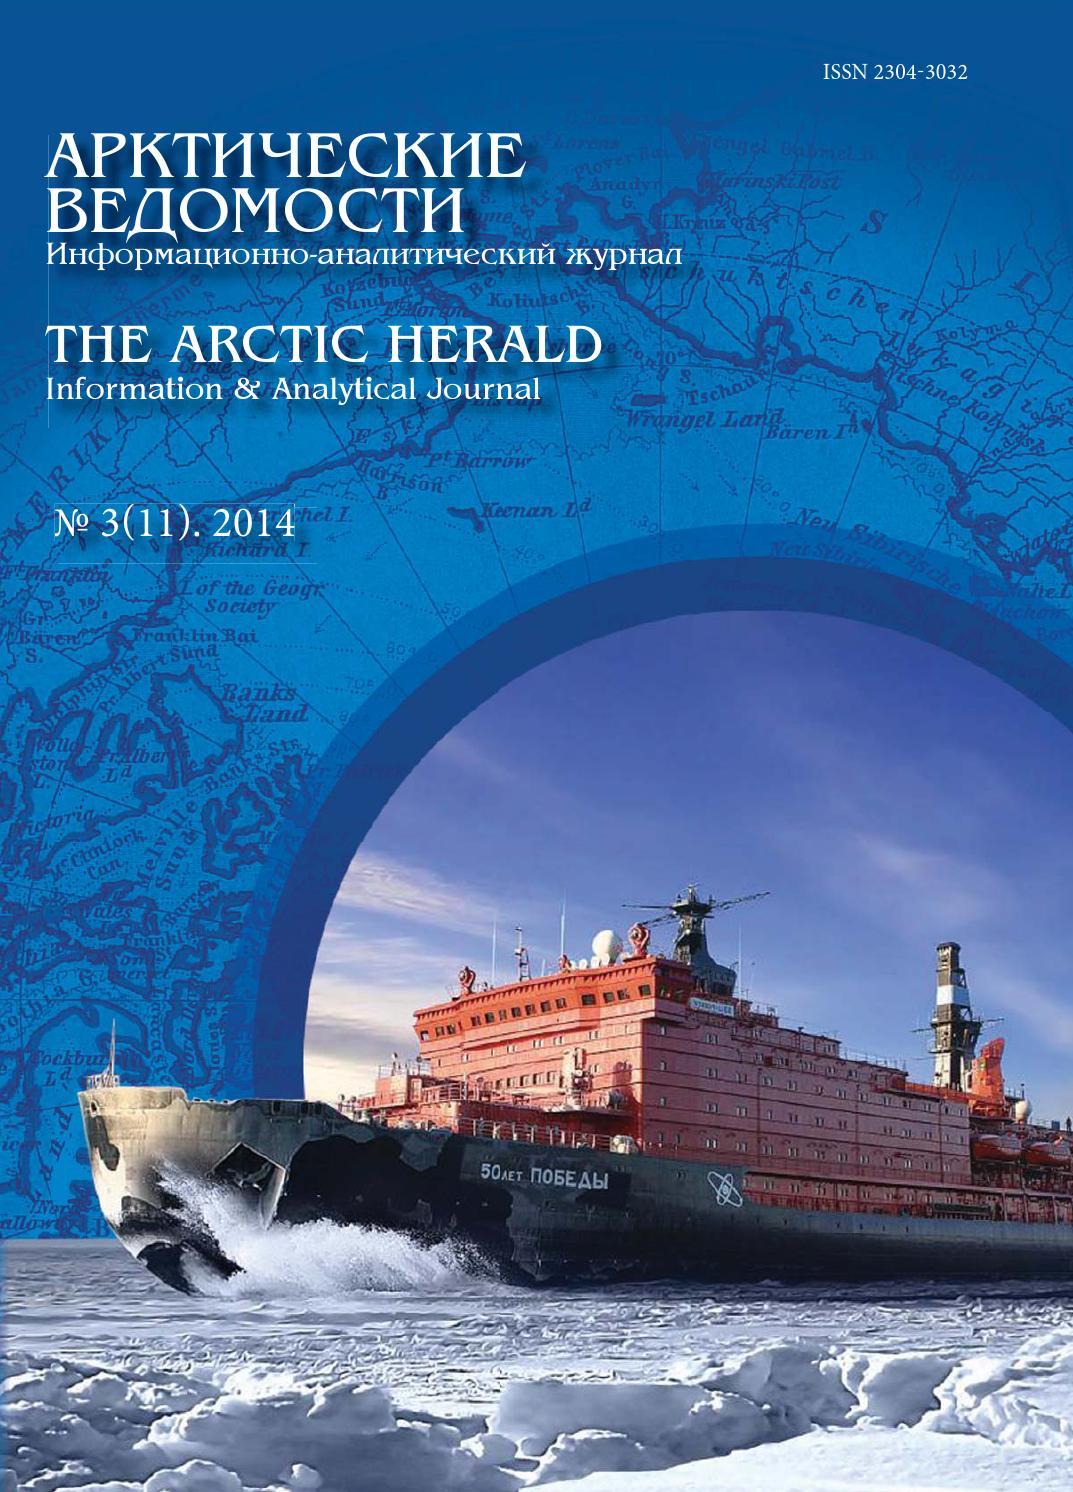 The Arctic herald #<b>3</b> (11) 2014 by Arctic Herald - issuu